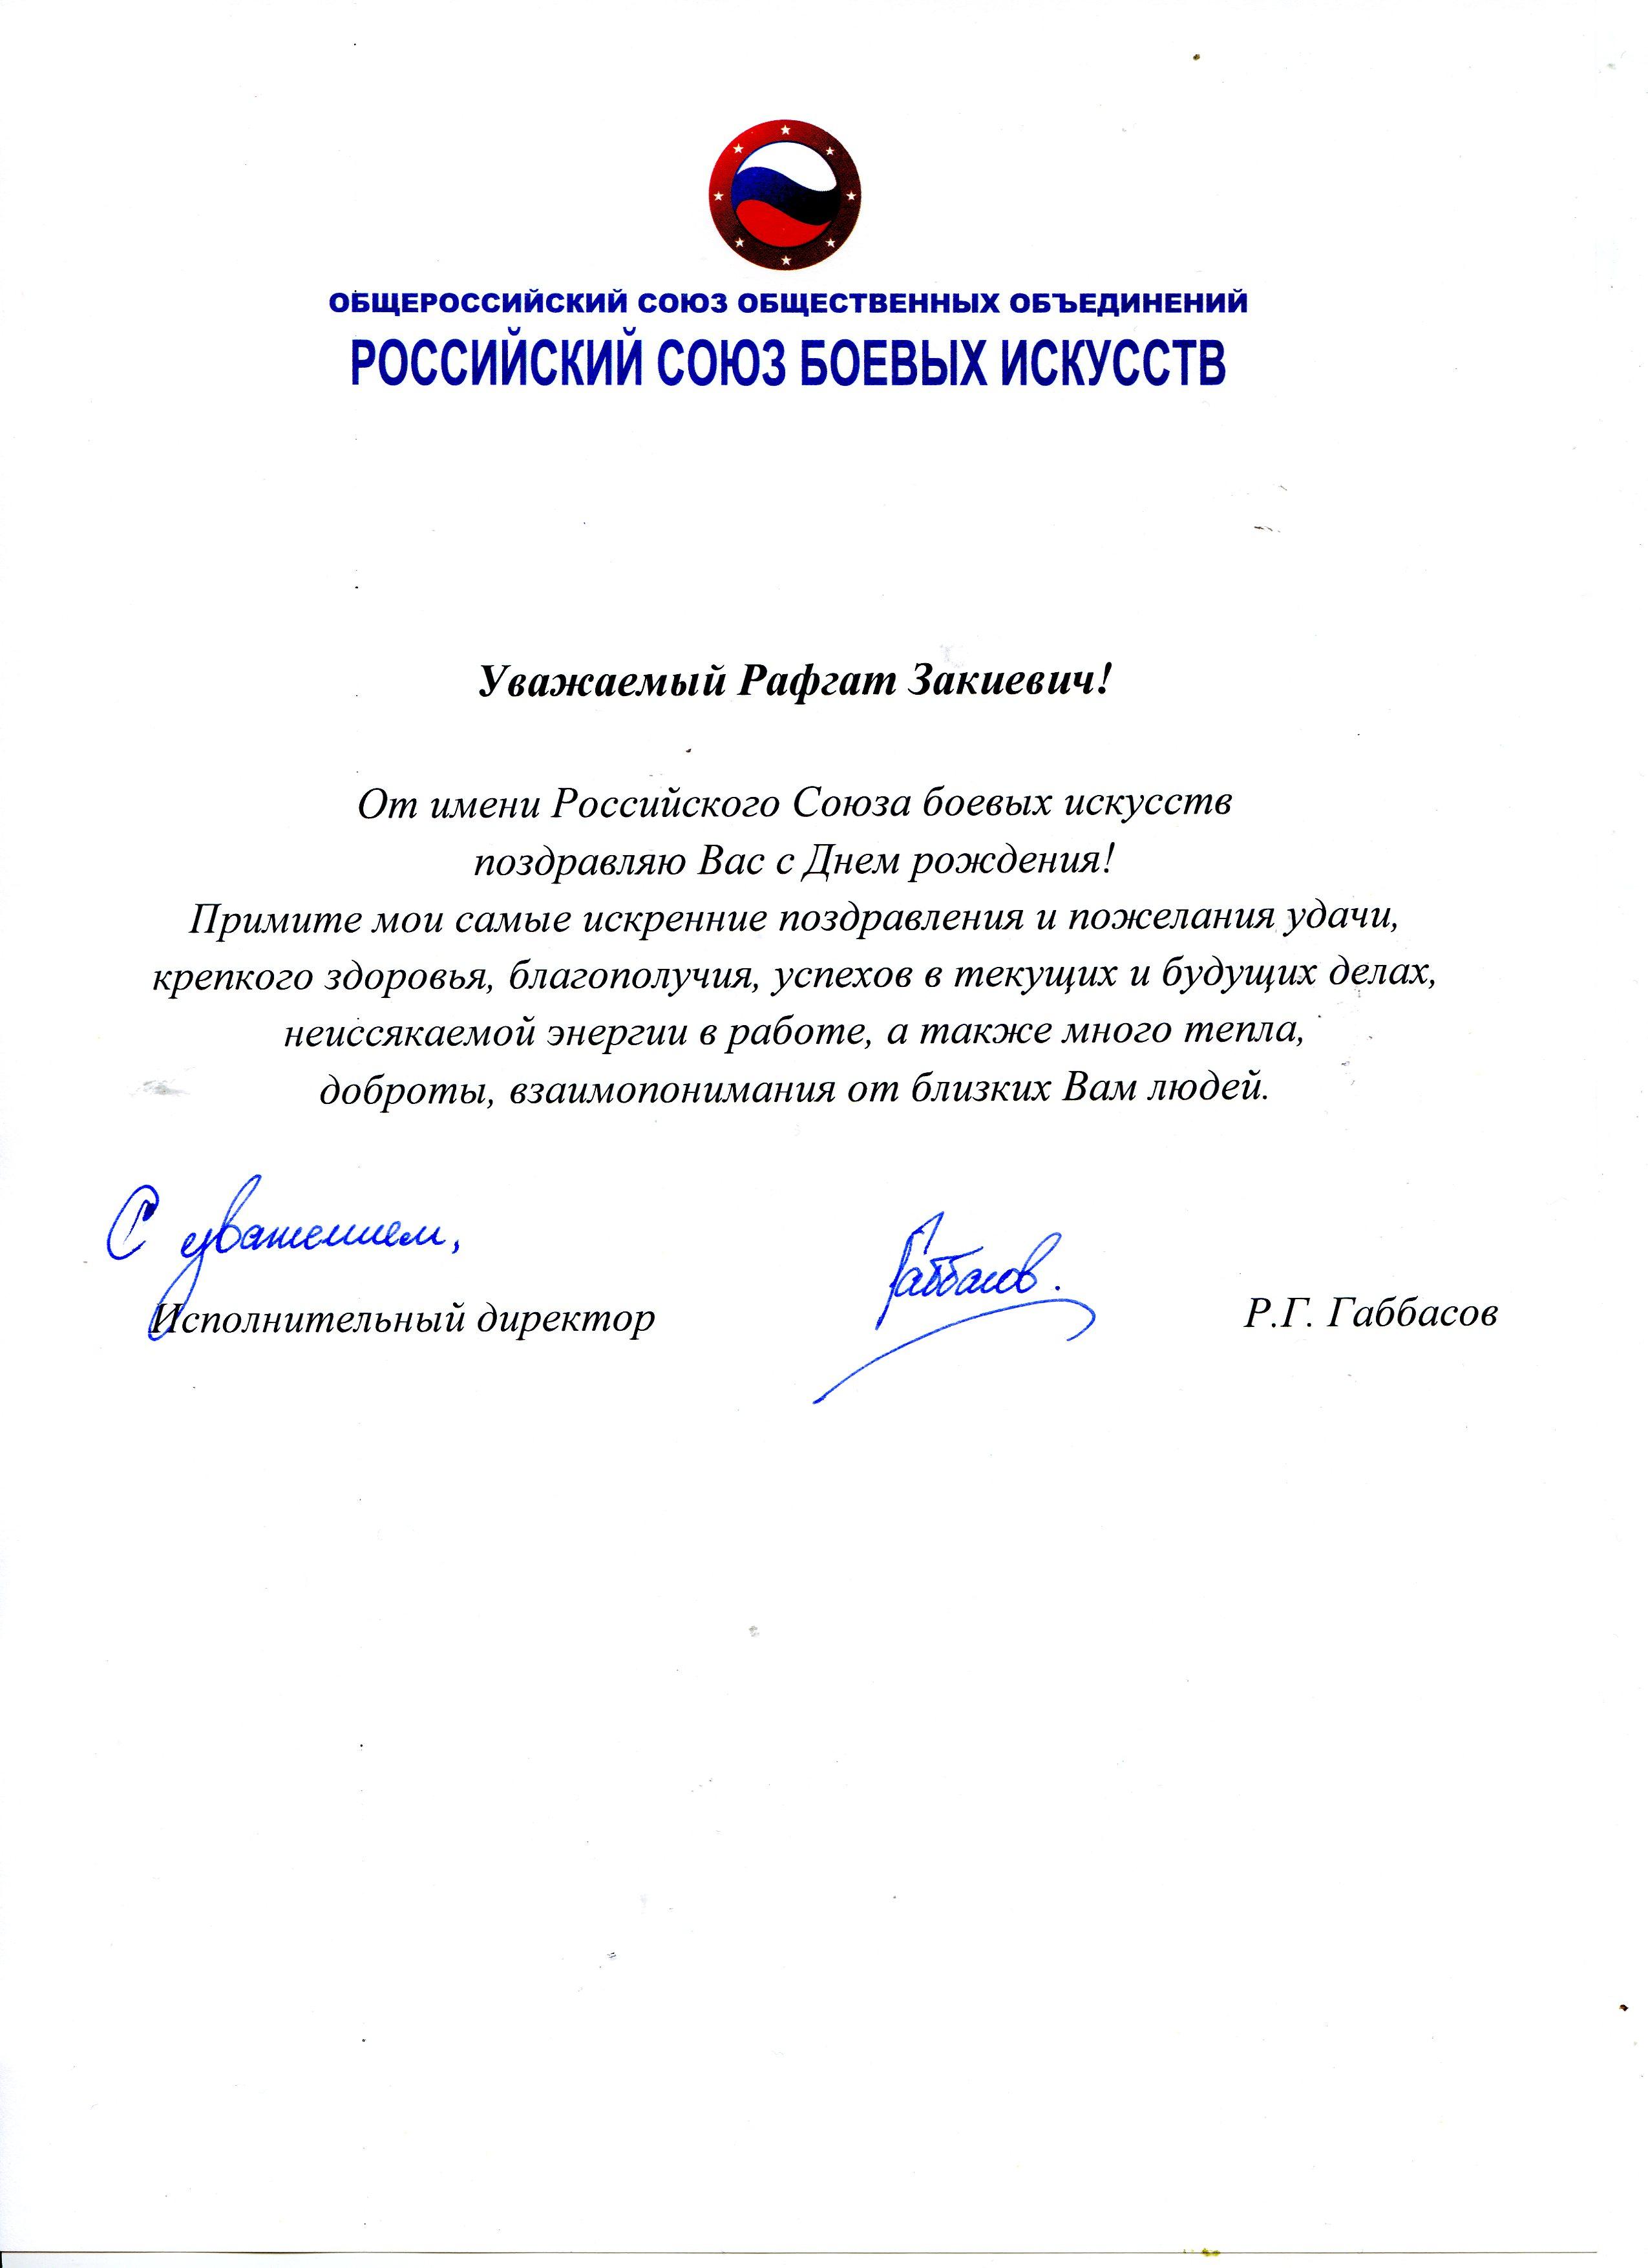 http://combatsd.ru/images/upload/img449.jpg